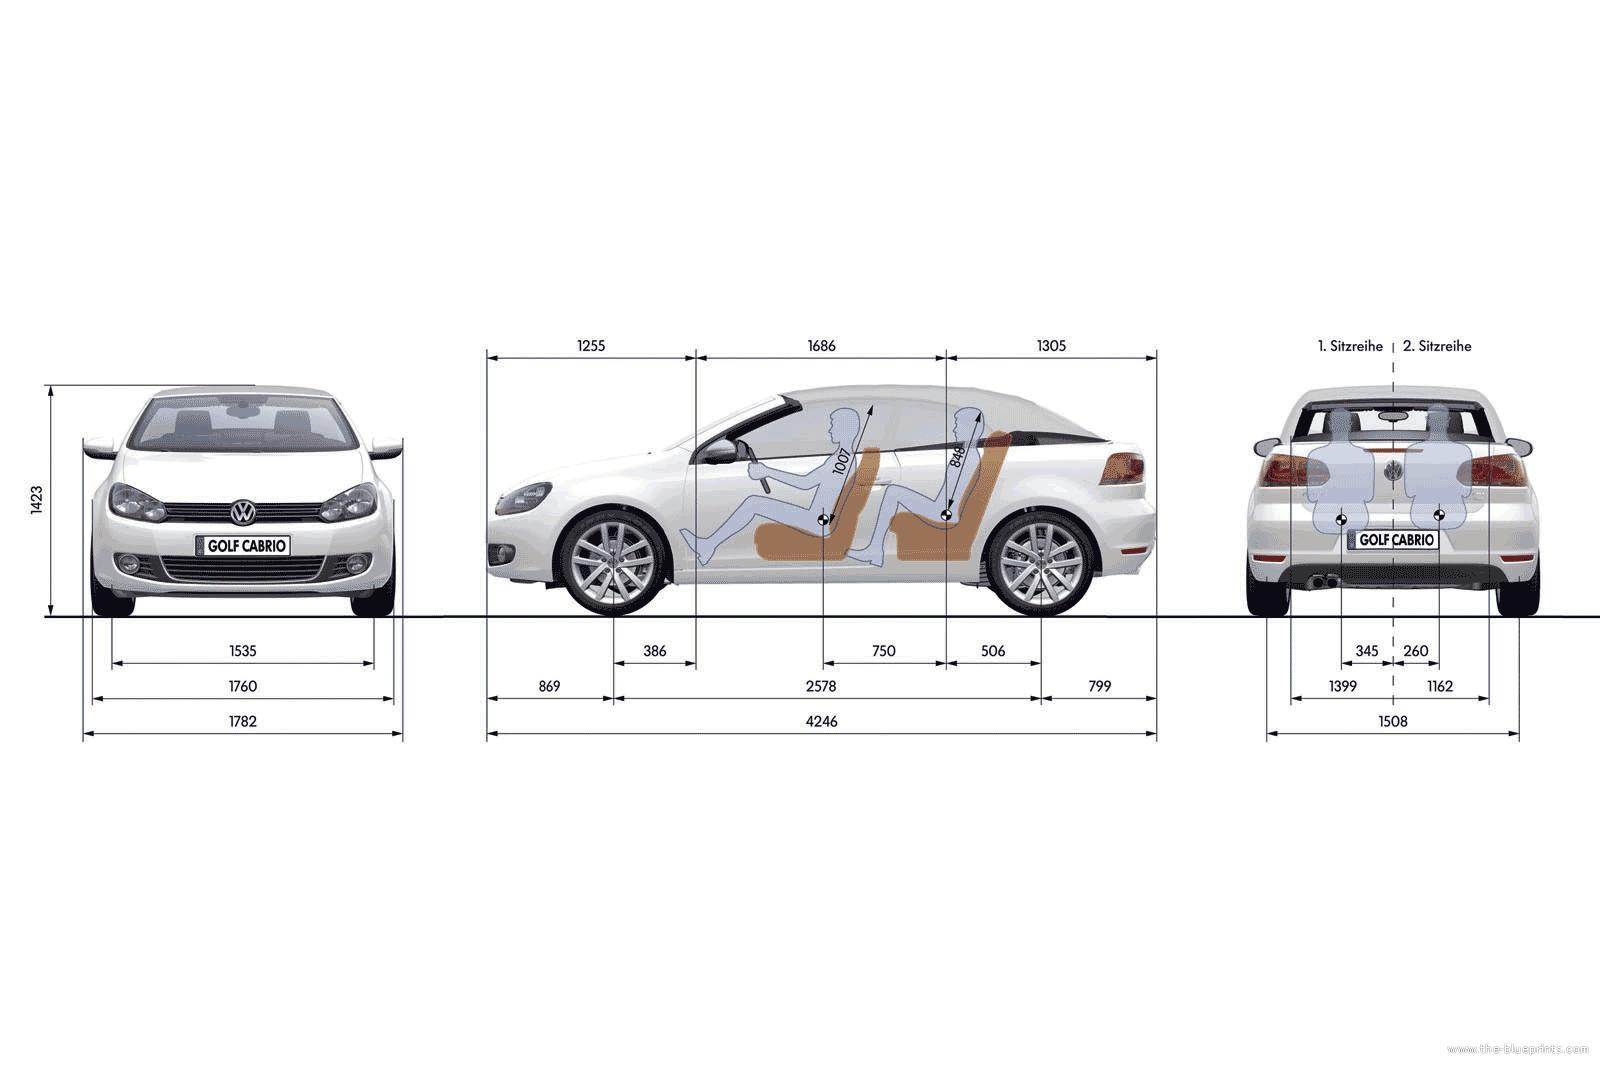 Blueprints > Cars > Volkswagen > Volkswagen Golf VI Cabrio